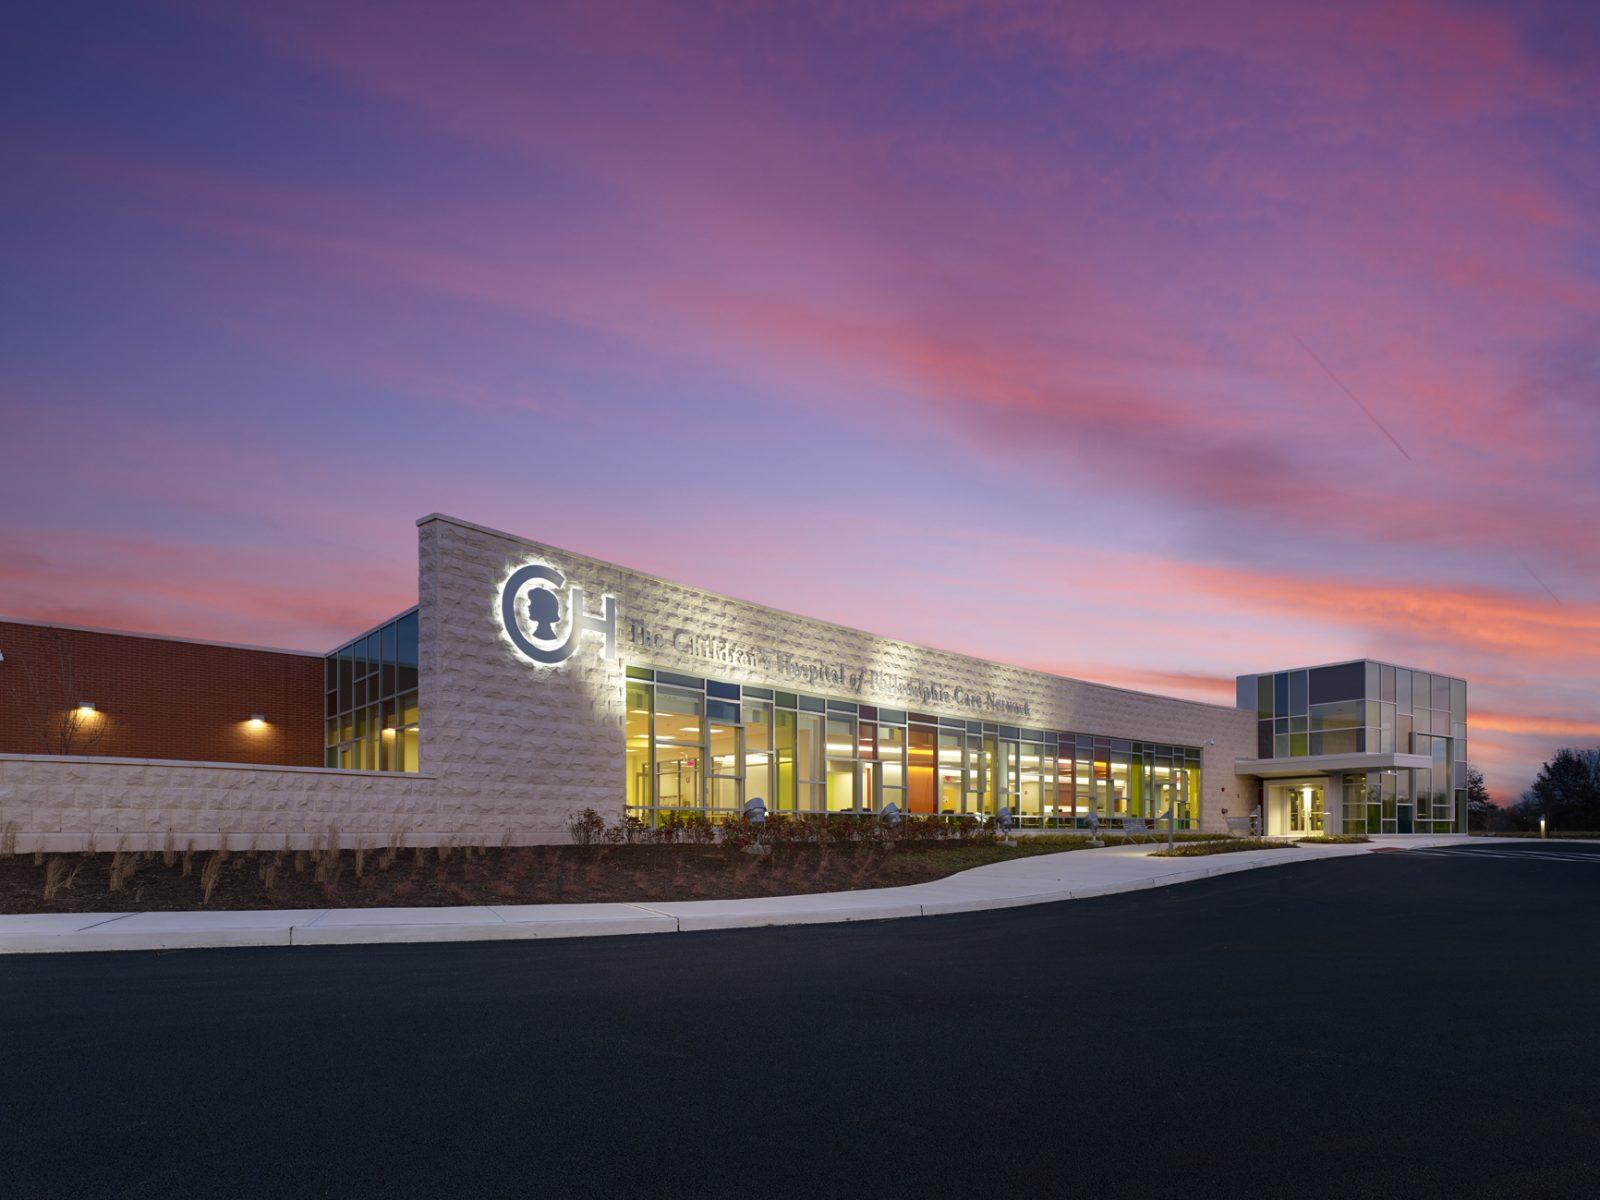 Childrens Hospital At Plainsboro